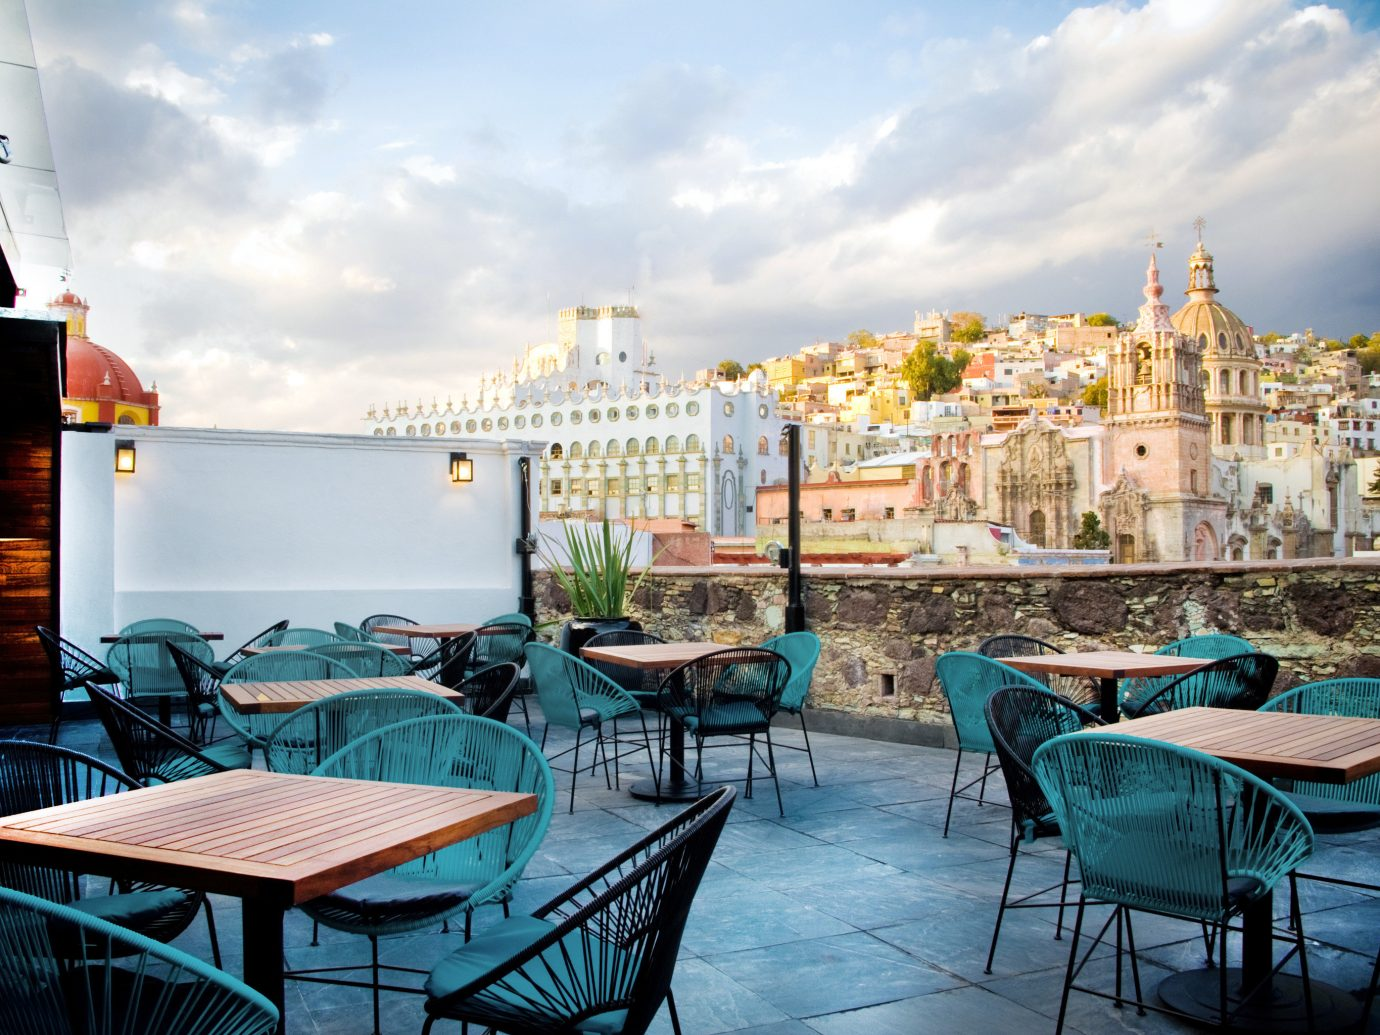 Boutique Deck Modern Patio Scenic views Trip Ideas sky chair outdoor vacation estate Resort restaurant Harbor several